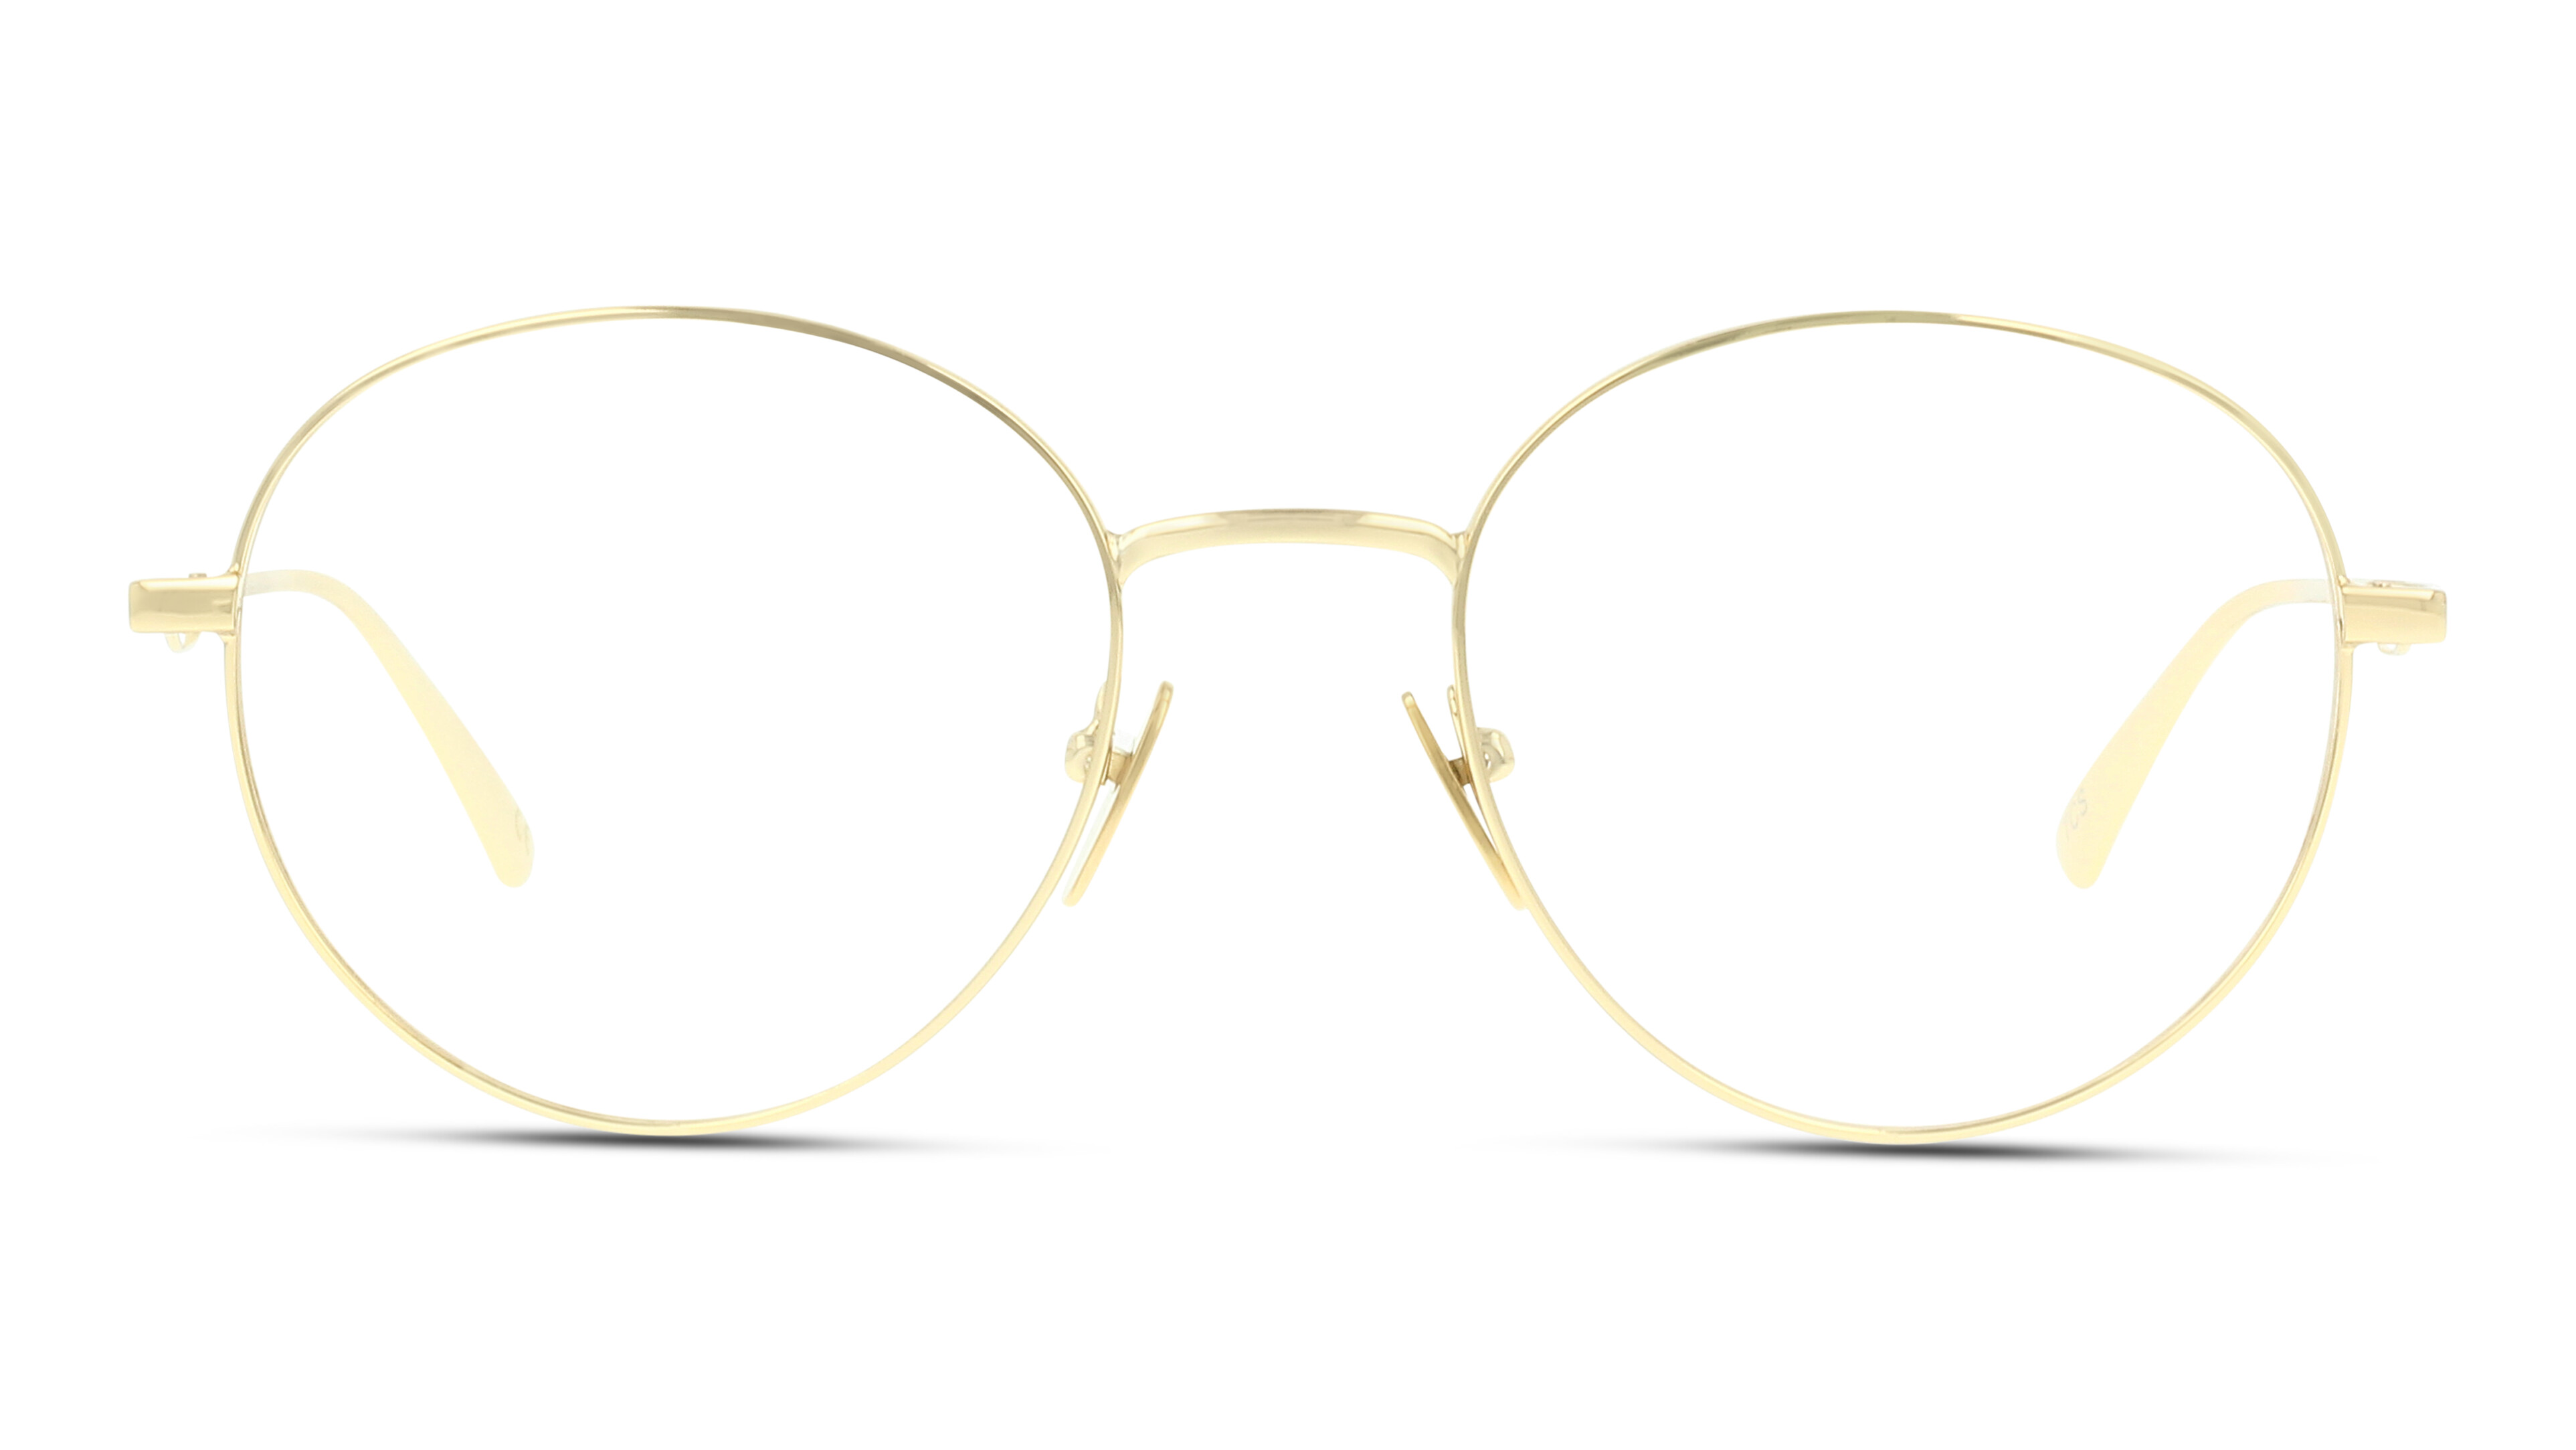 8056376261349-front-brillenfassung-gucci-gg0337o-gold-gold-transparent